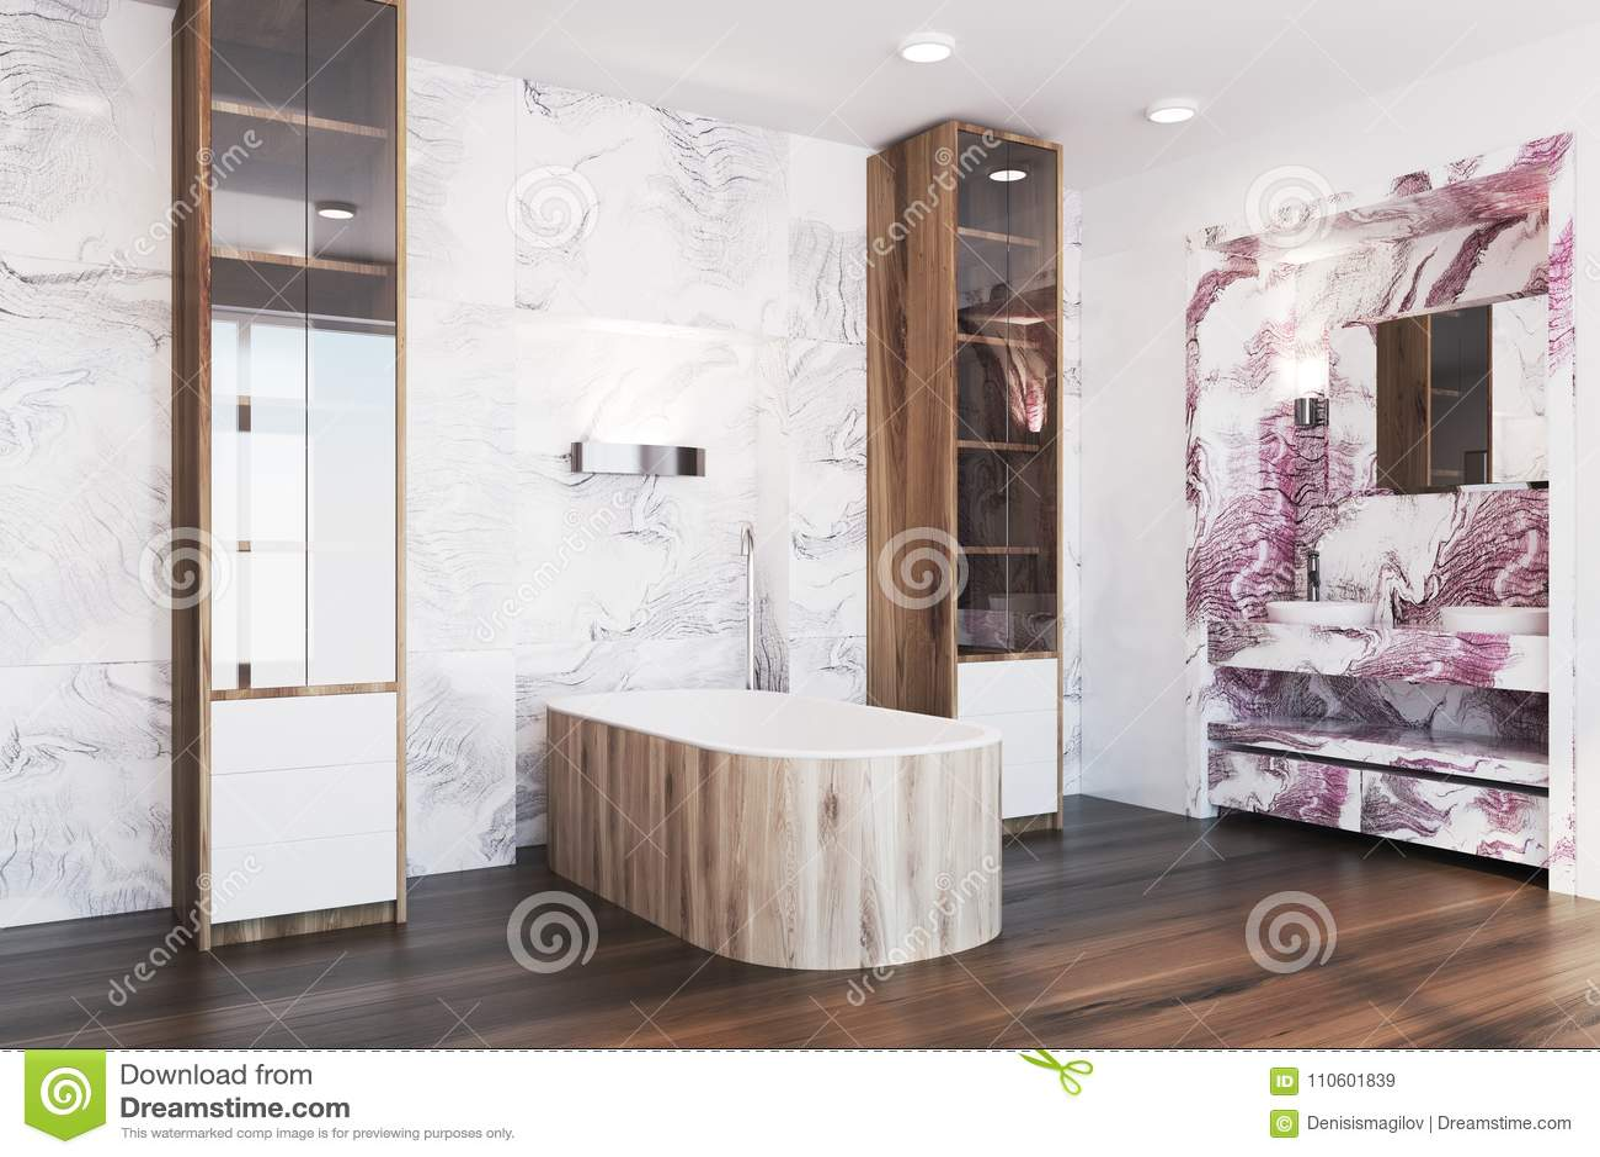 White And Red Marble Bathroom Interior Side Stock Illustration Illustration Of Fresh Bathtub 110601839